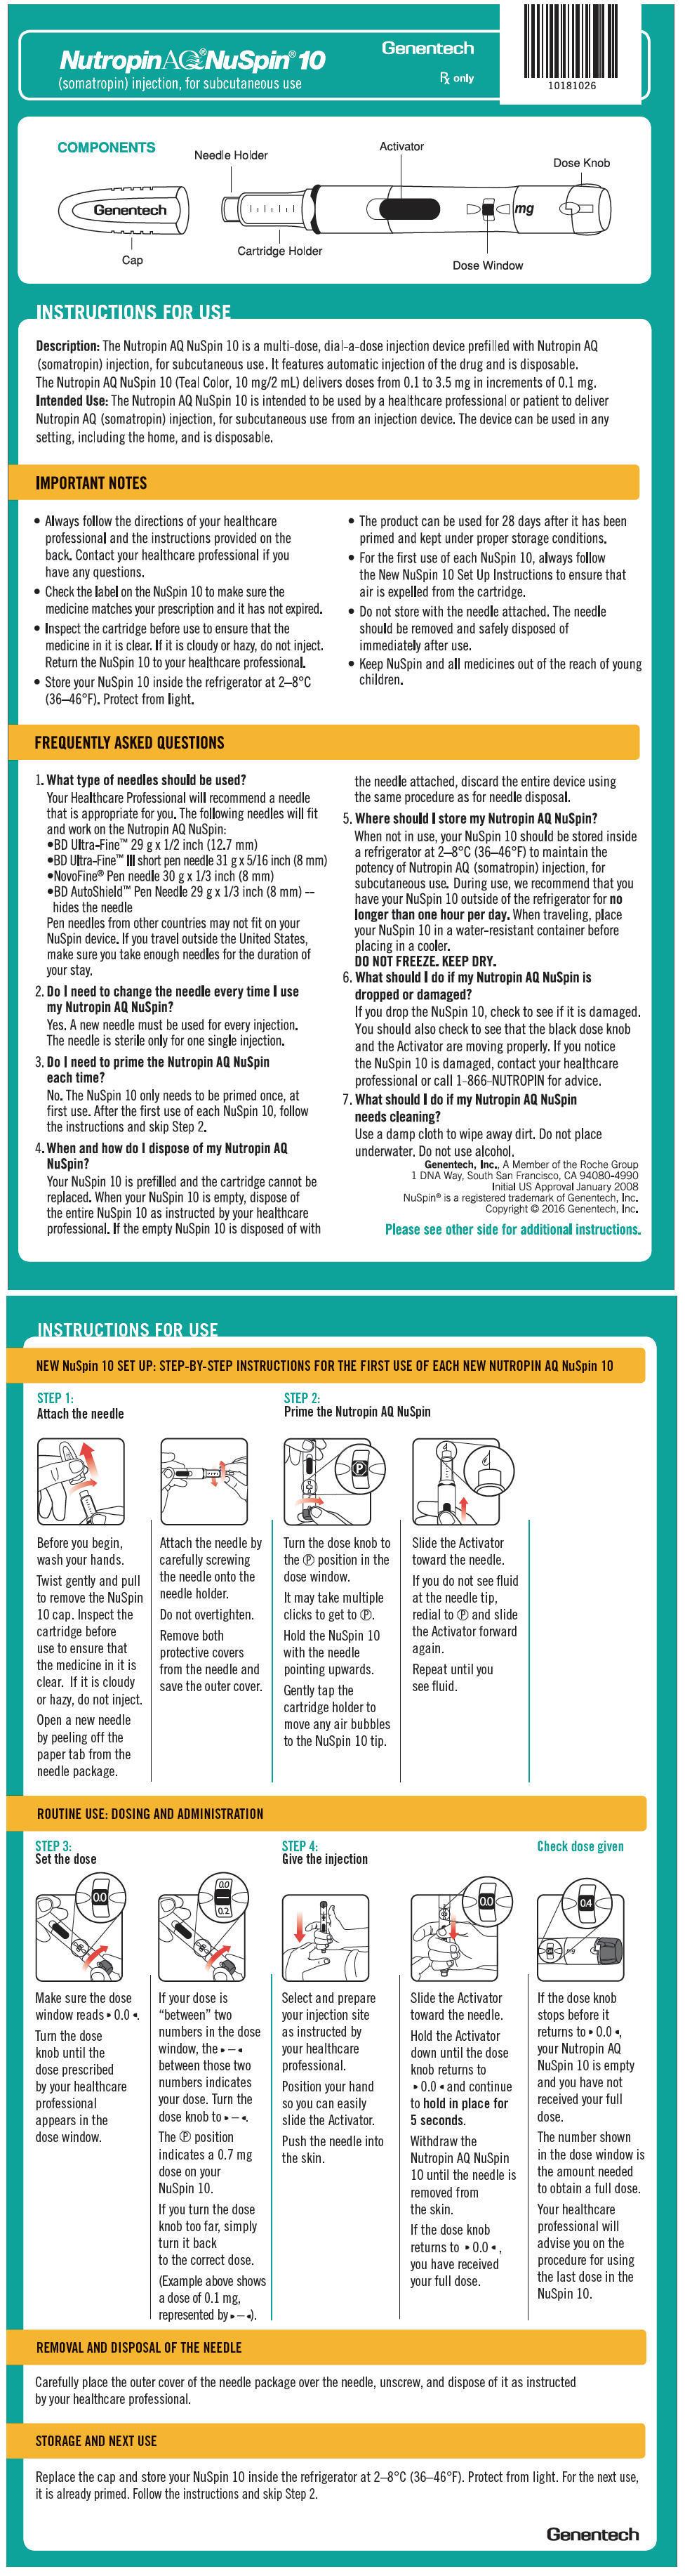 PRINCIPAL DISPLAY PANEL - 10 mg NuSpin IFU